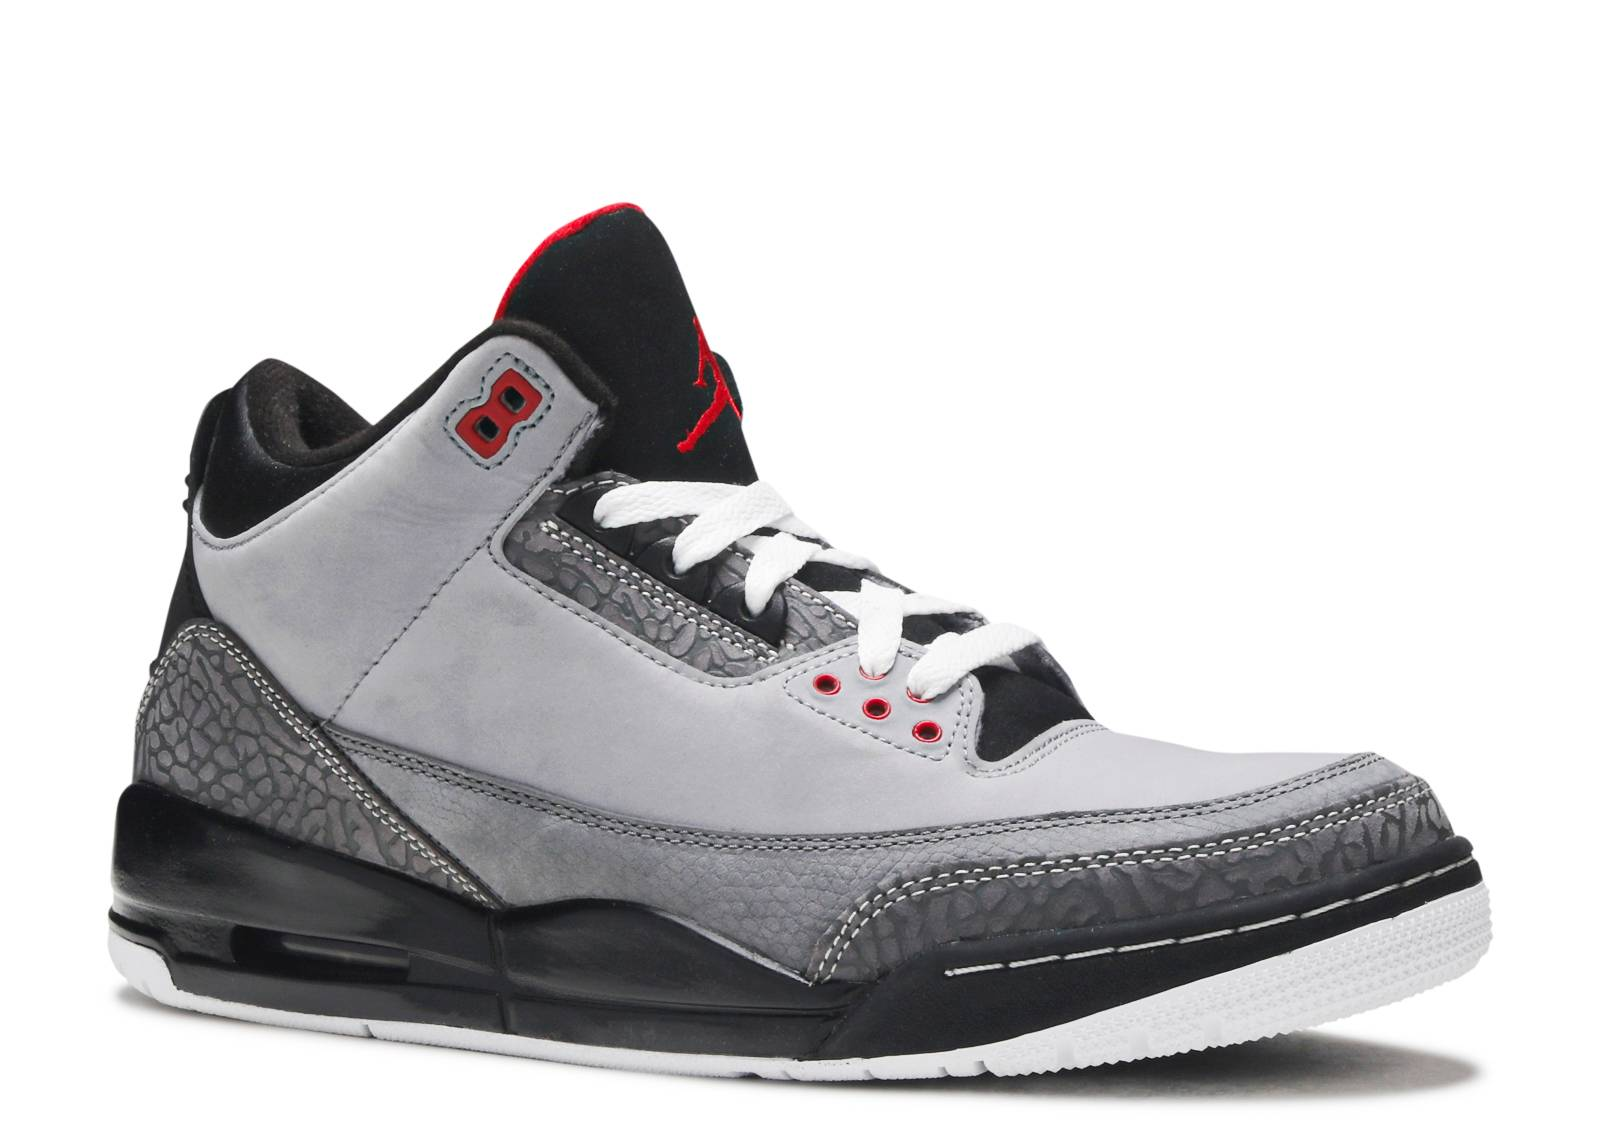 finest selection 26fc6 973aa Air Jordan 3 Retro